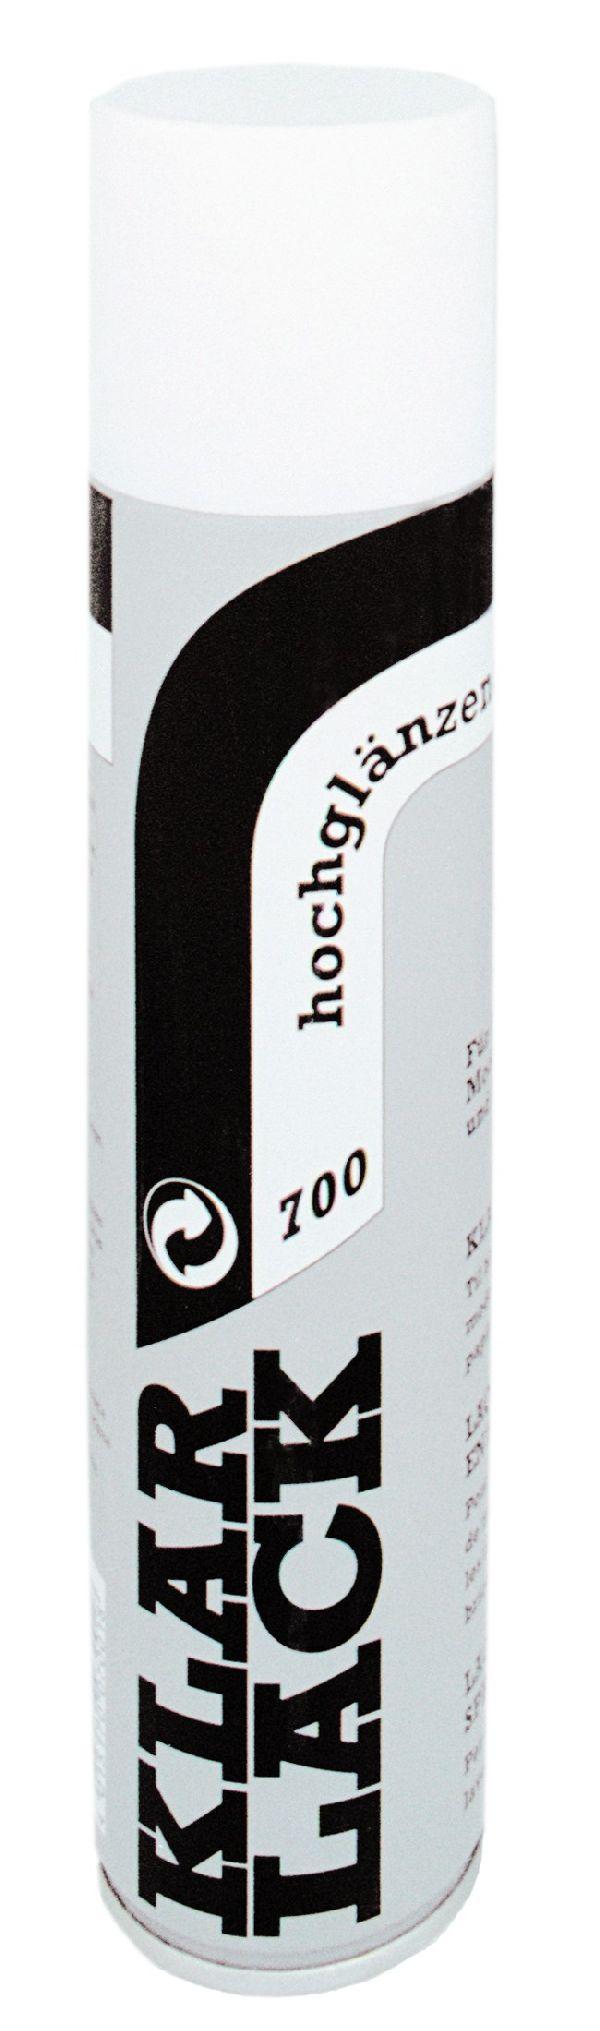 Sprühlacke klarlack 700 400 ml hochglänzend